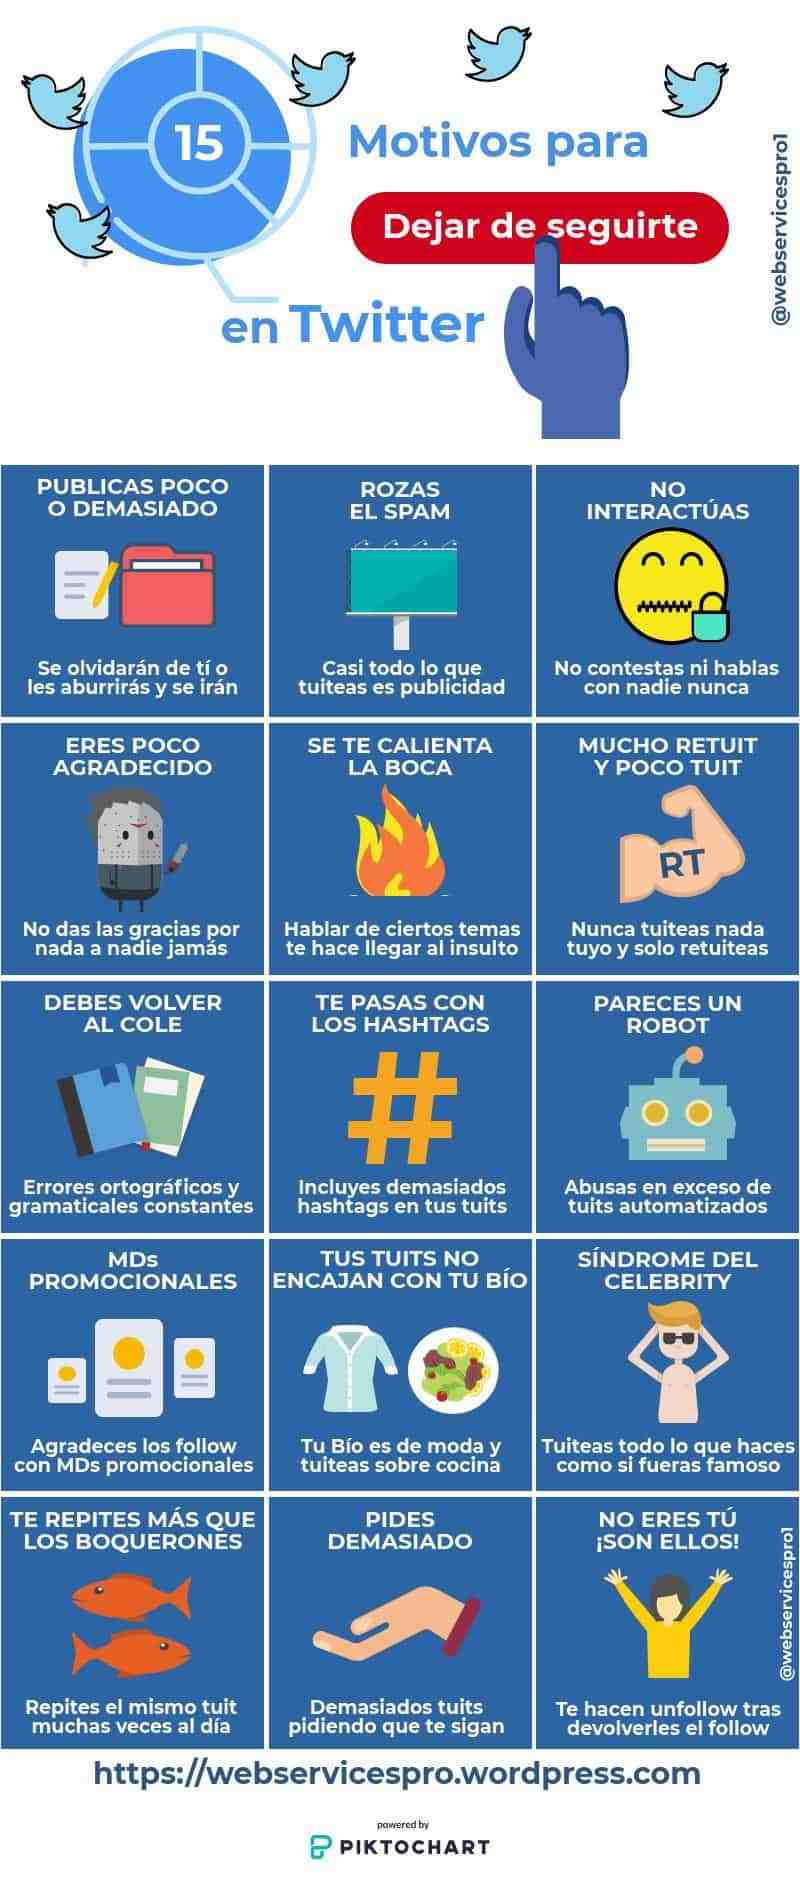 15 Motivos para dejar de seguirte en Twitter #infografia #infographic #socialmedia